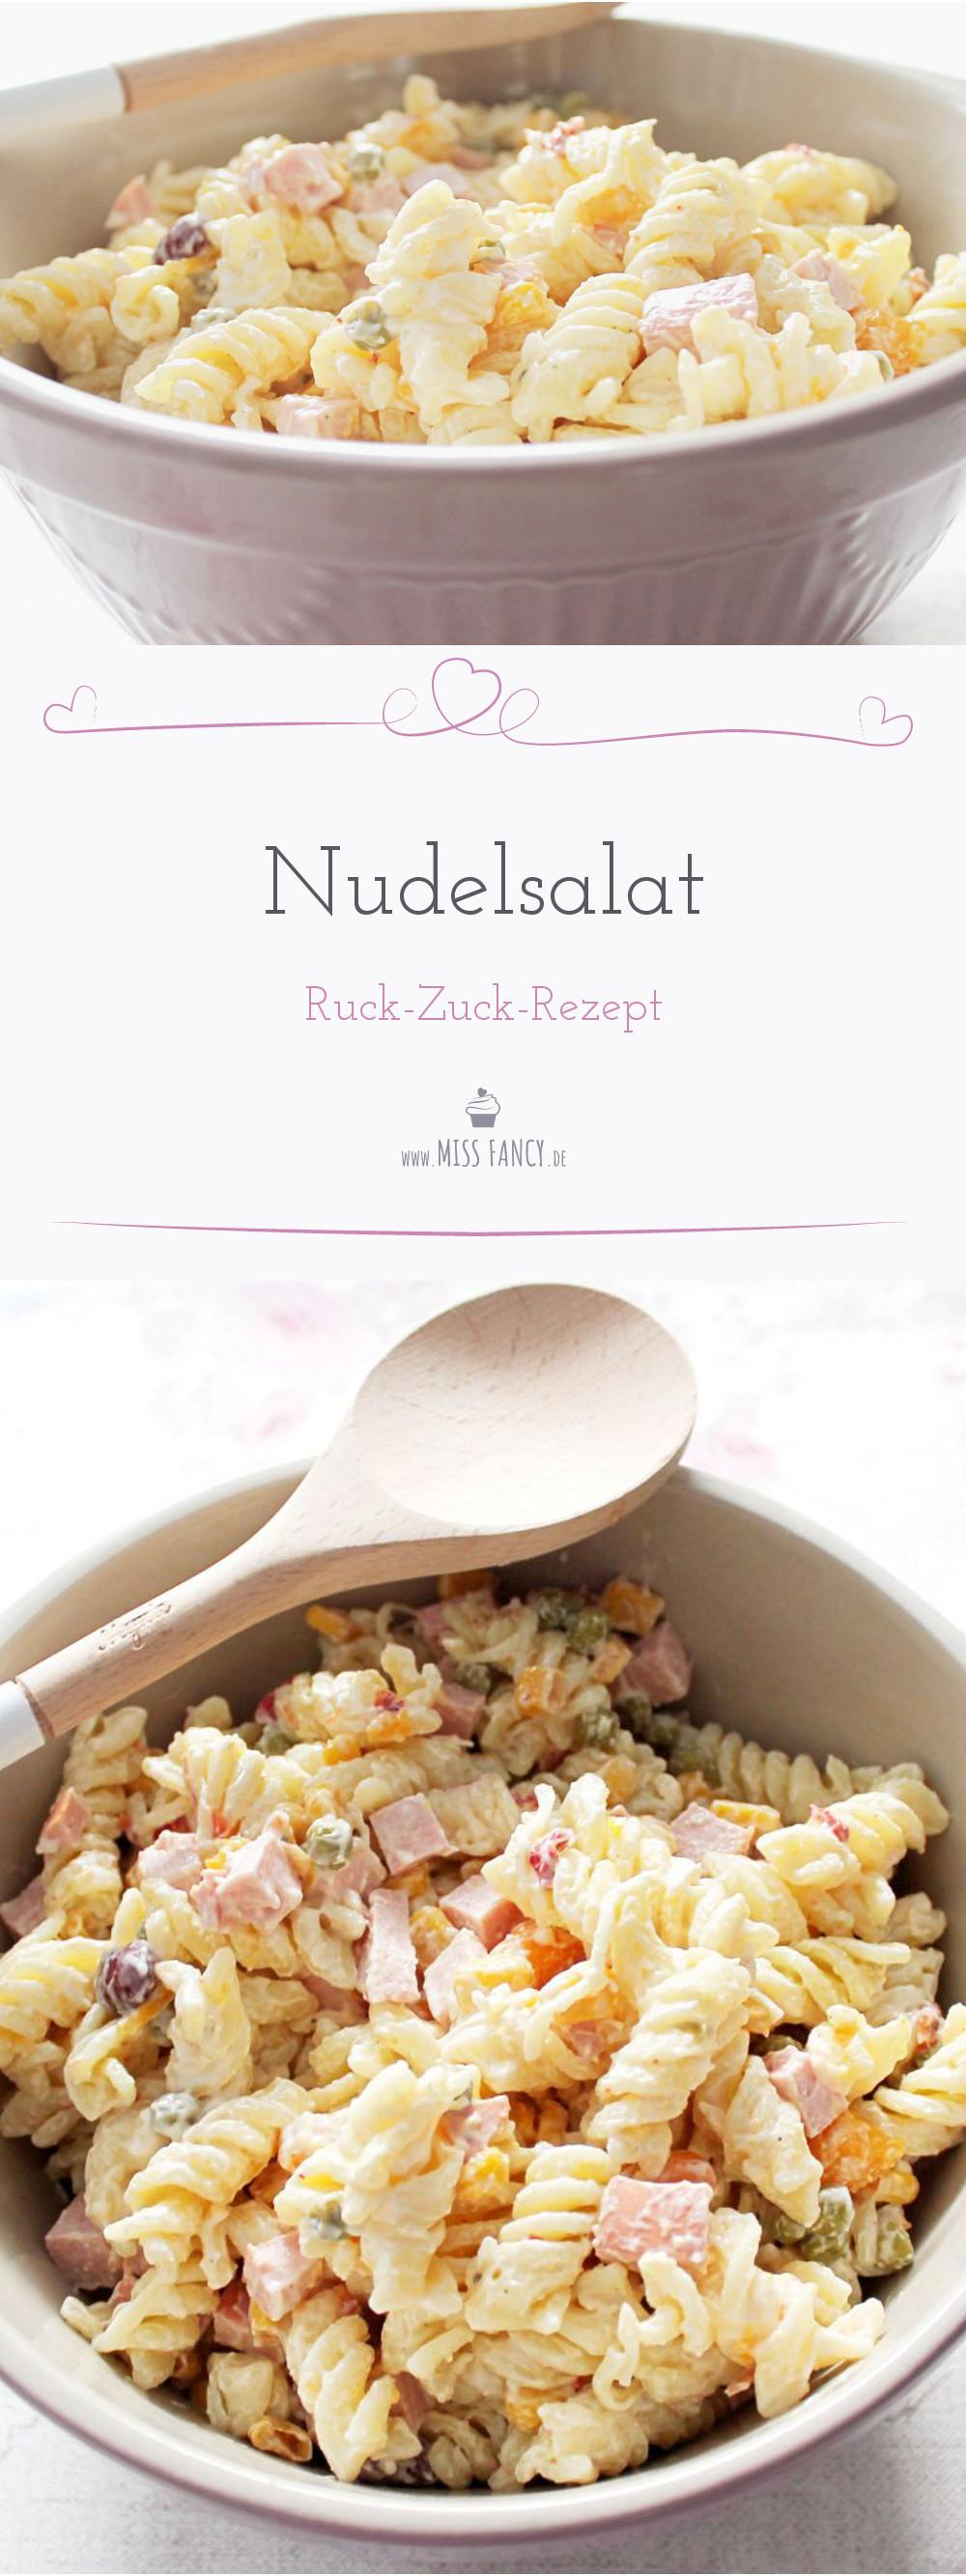 Nudelsalat-missfancyde